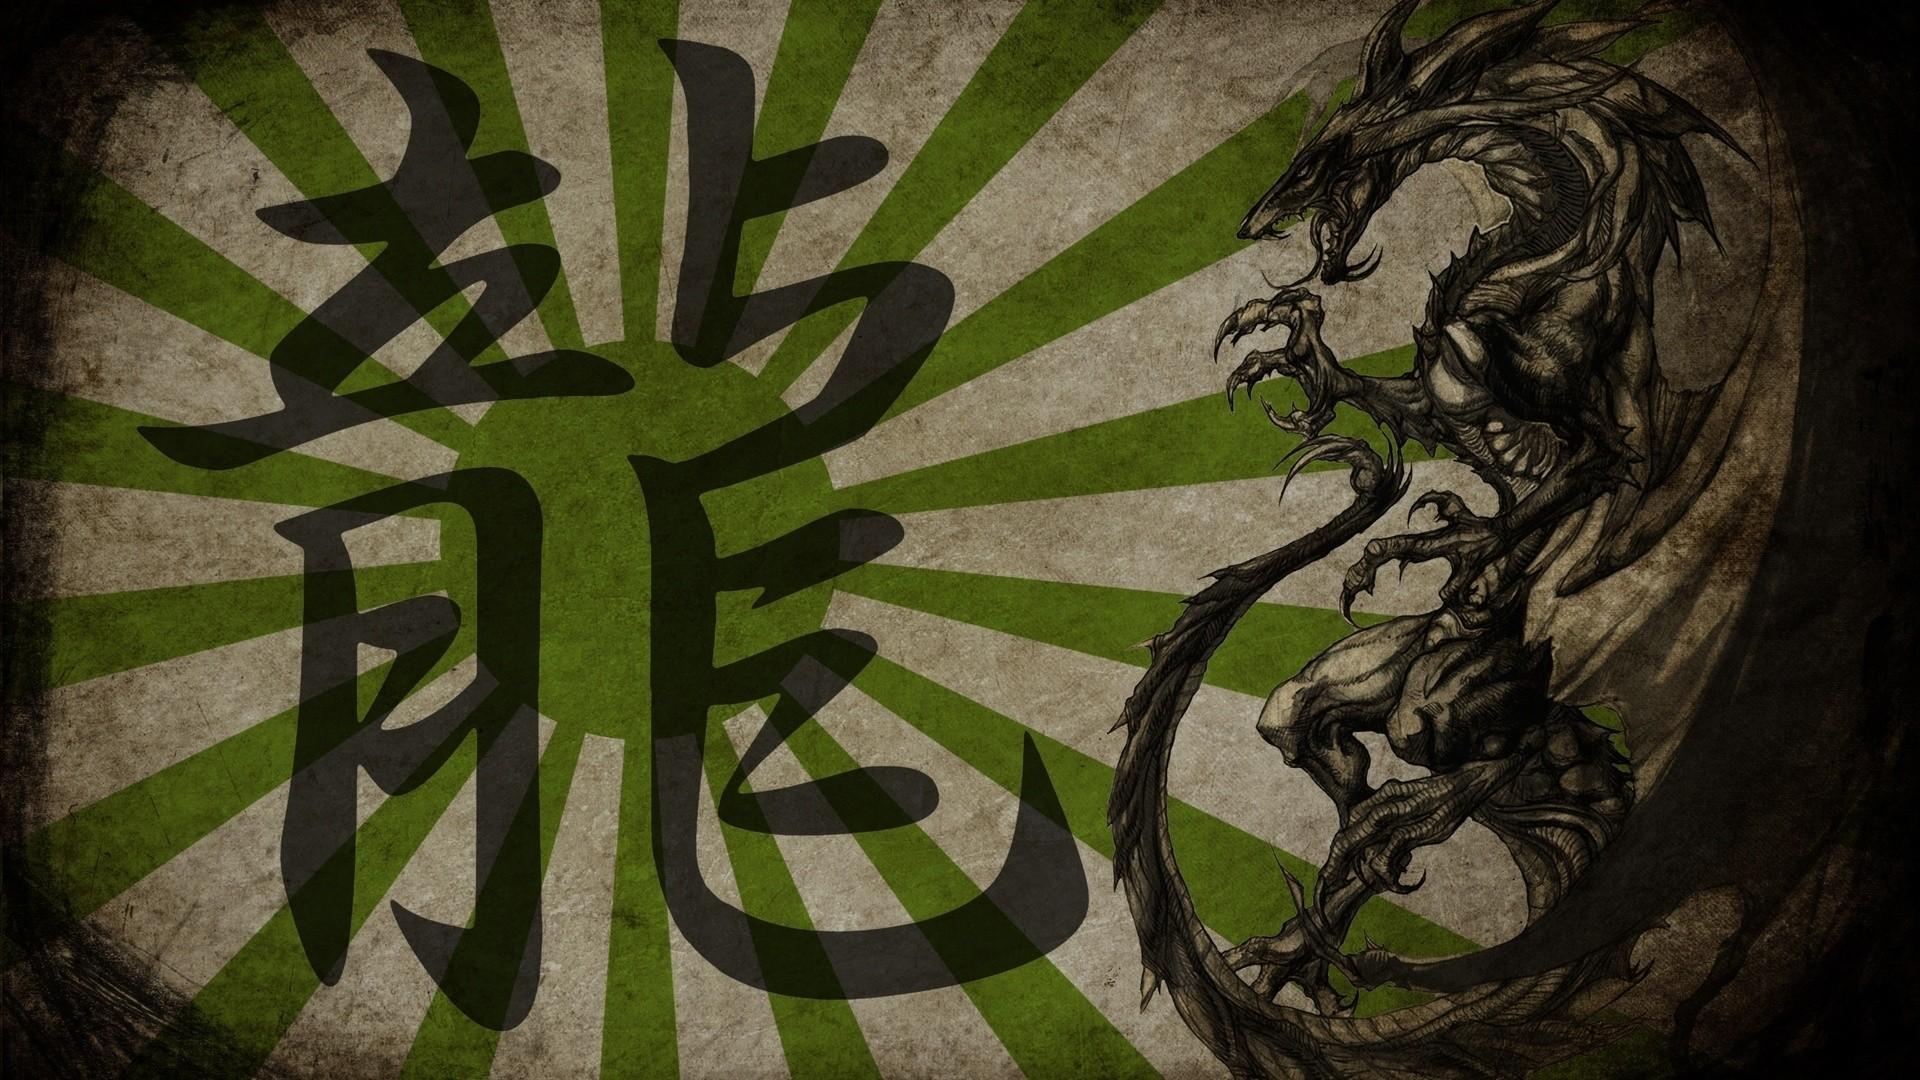 Japan Sun Wallpaper 1920x1080 Japan Sun Dragons Japanese Digital 1920x1080